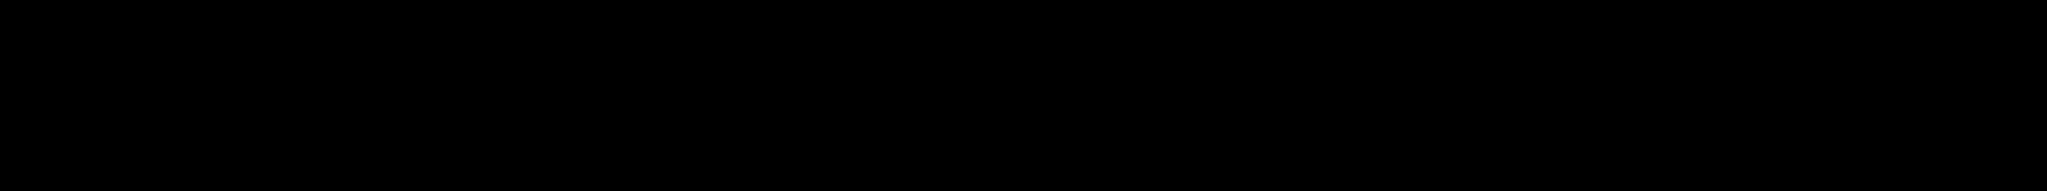 Design System F 700R